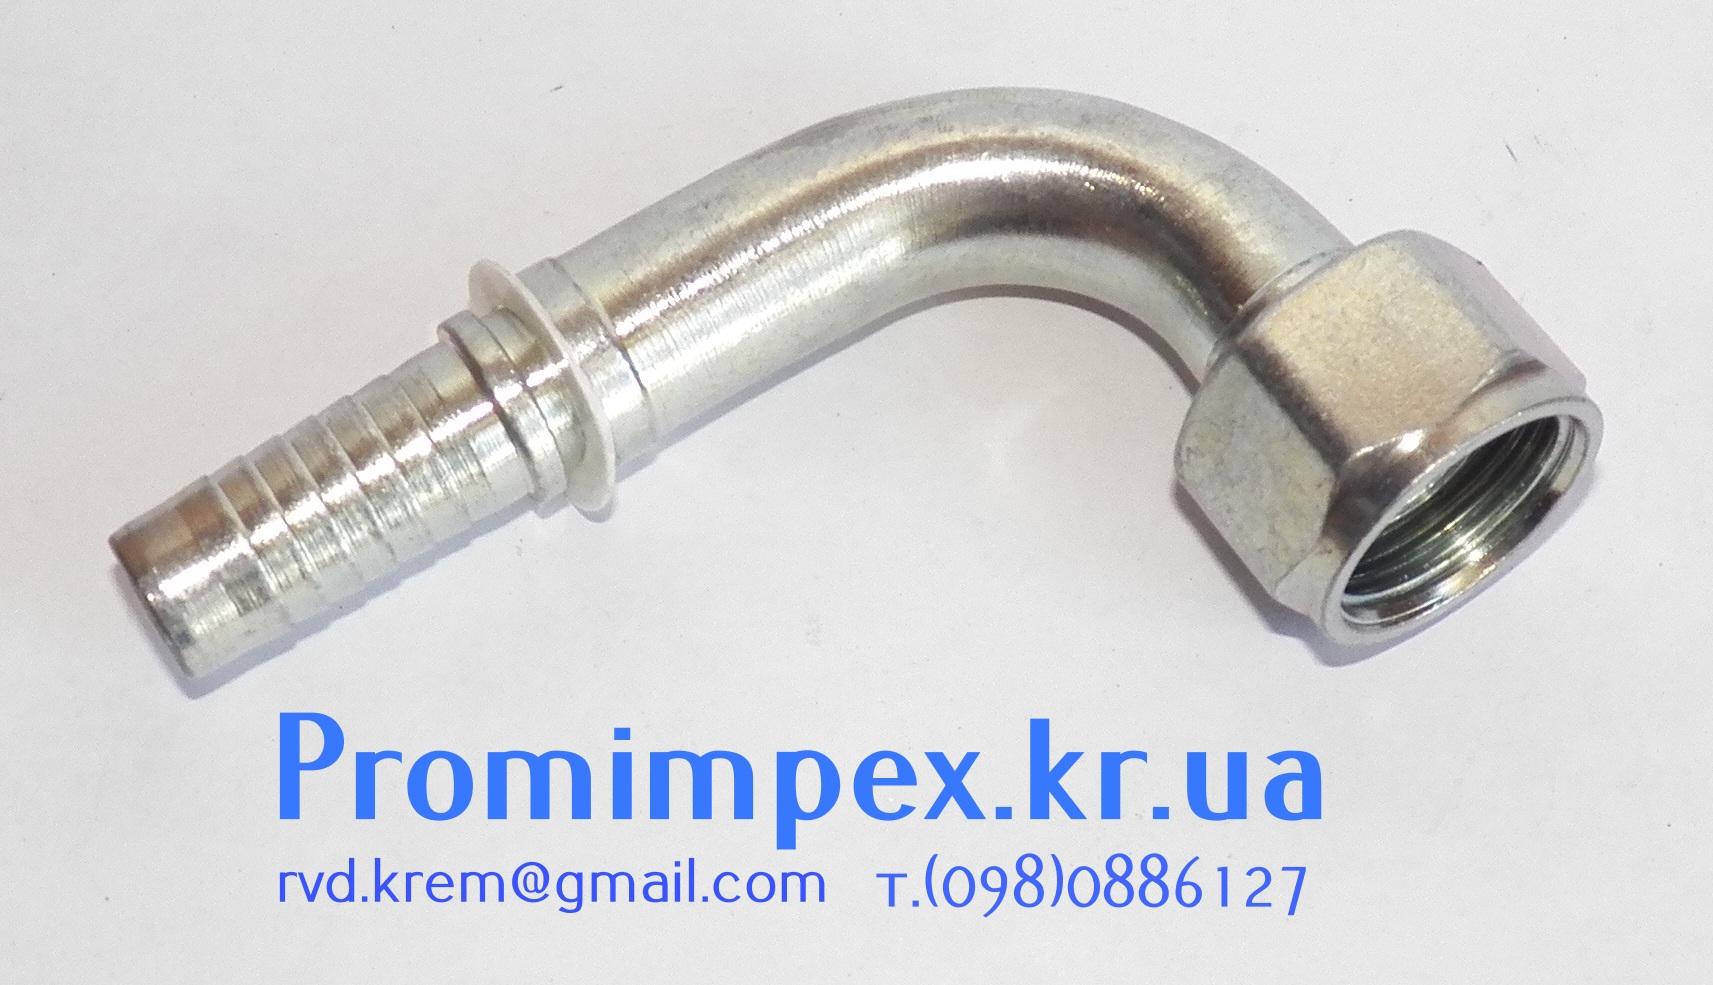 Комплект DKR угловой 3/4″ 90º